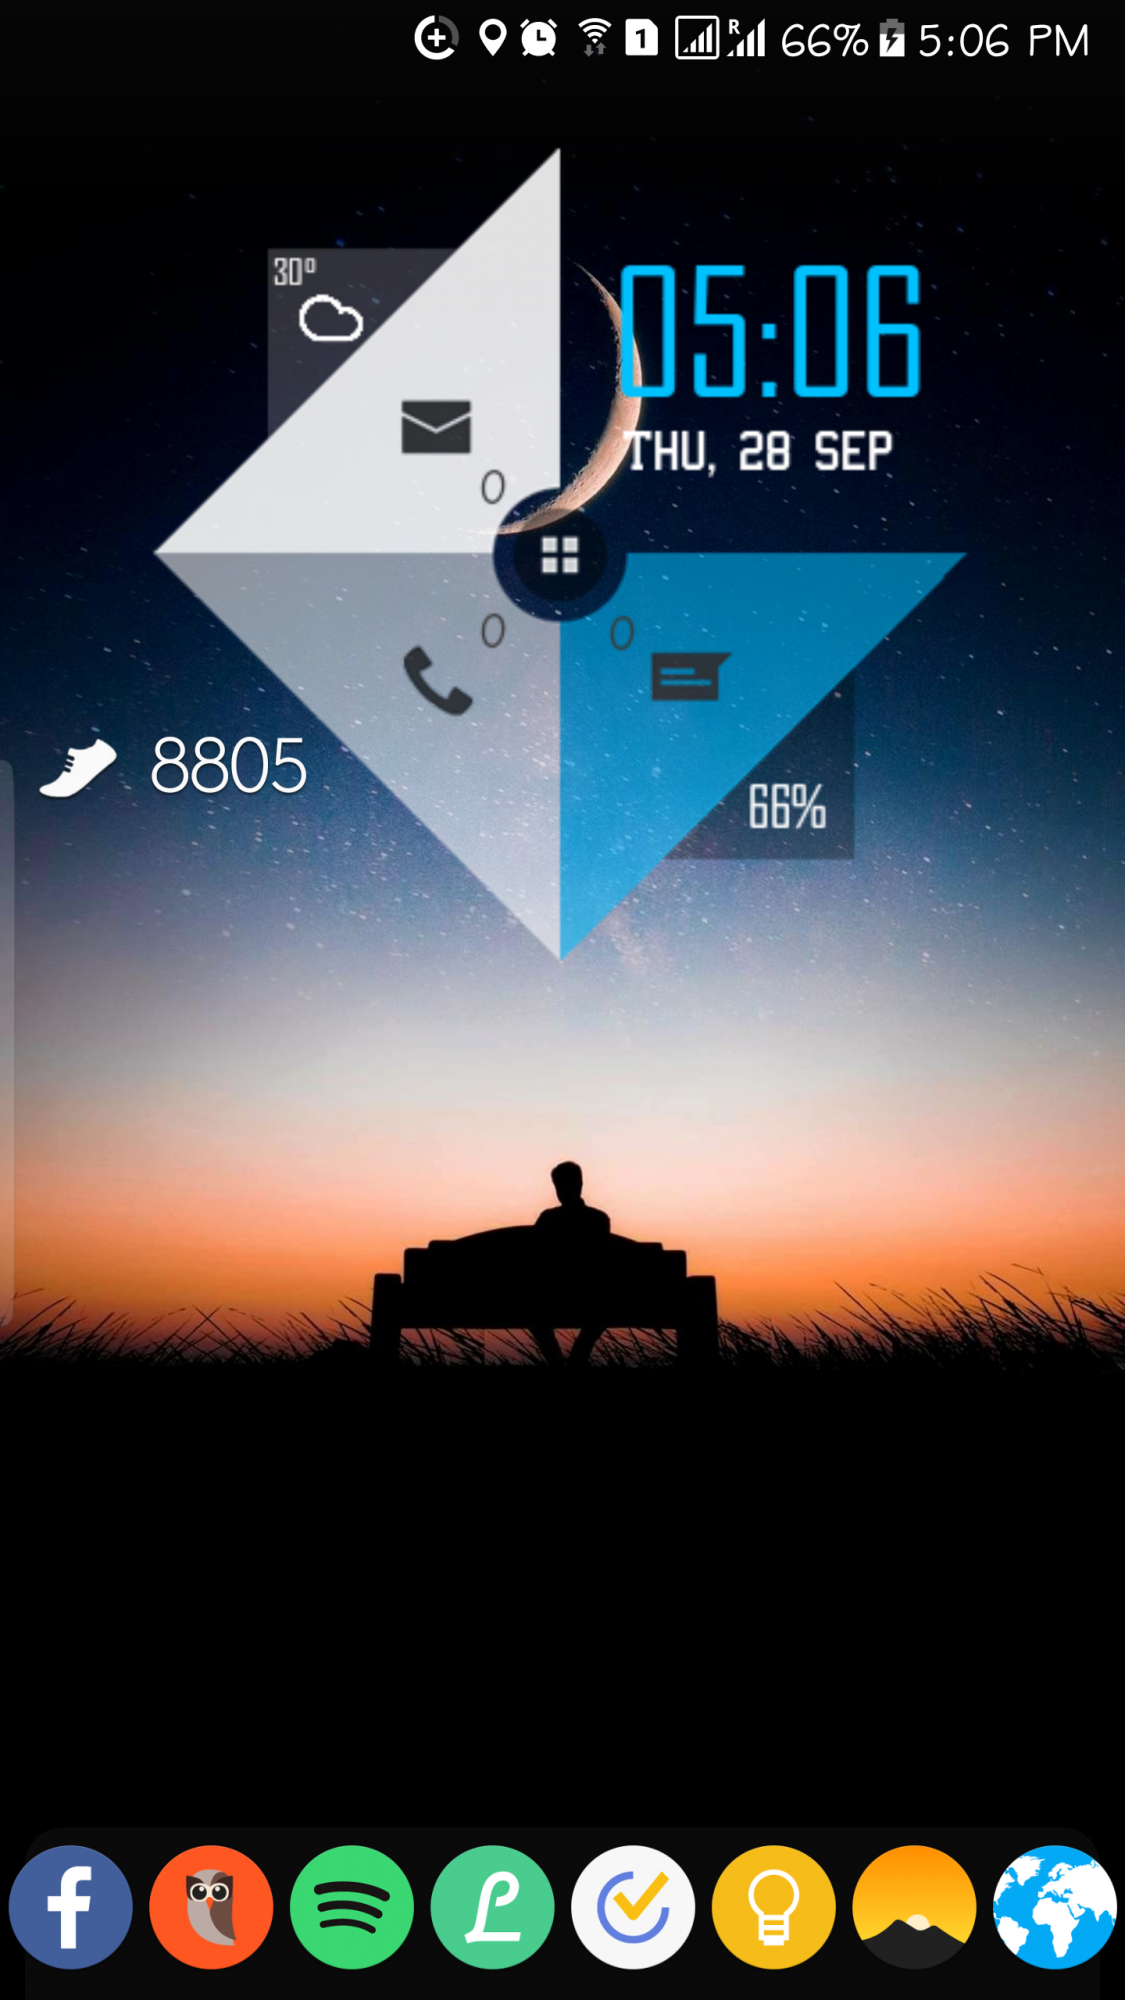 Screenshot_20170928-170631.png